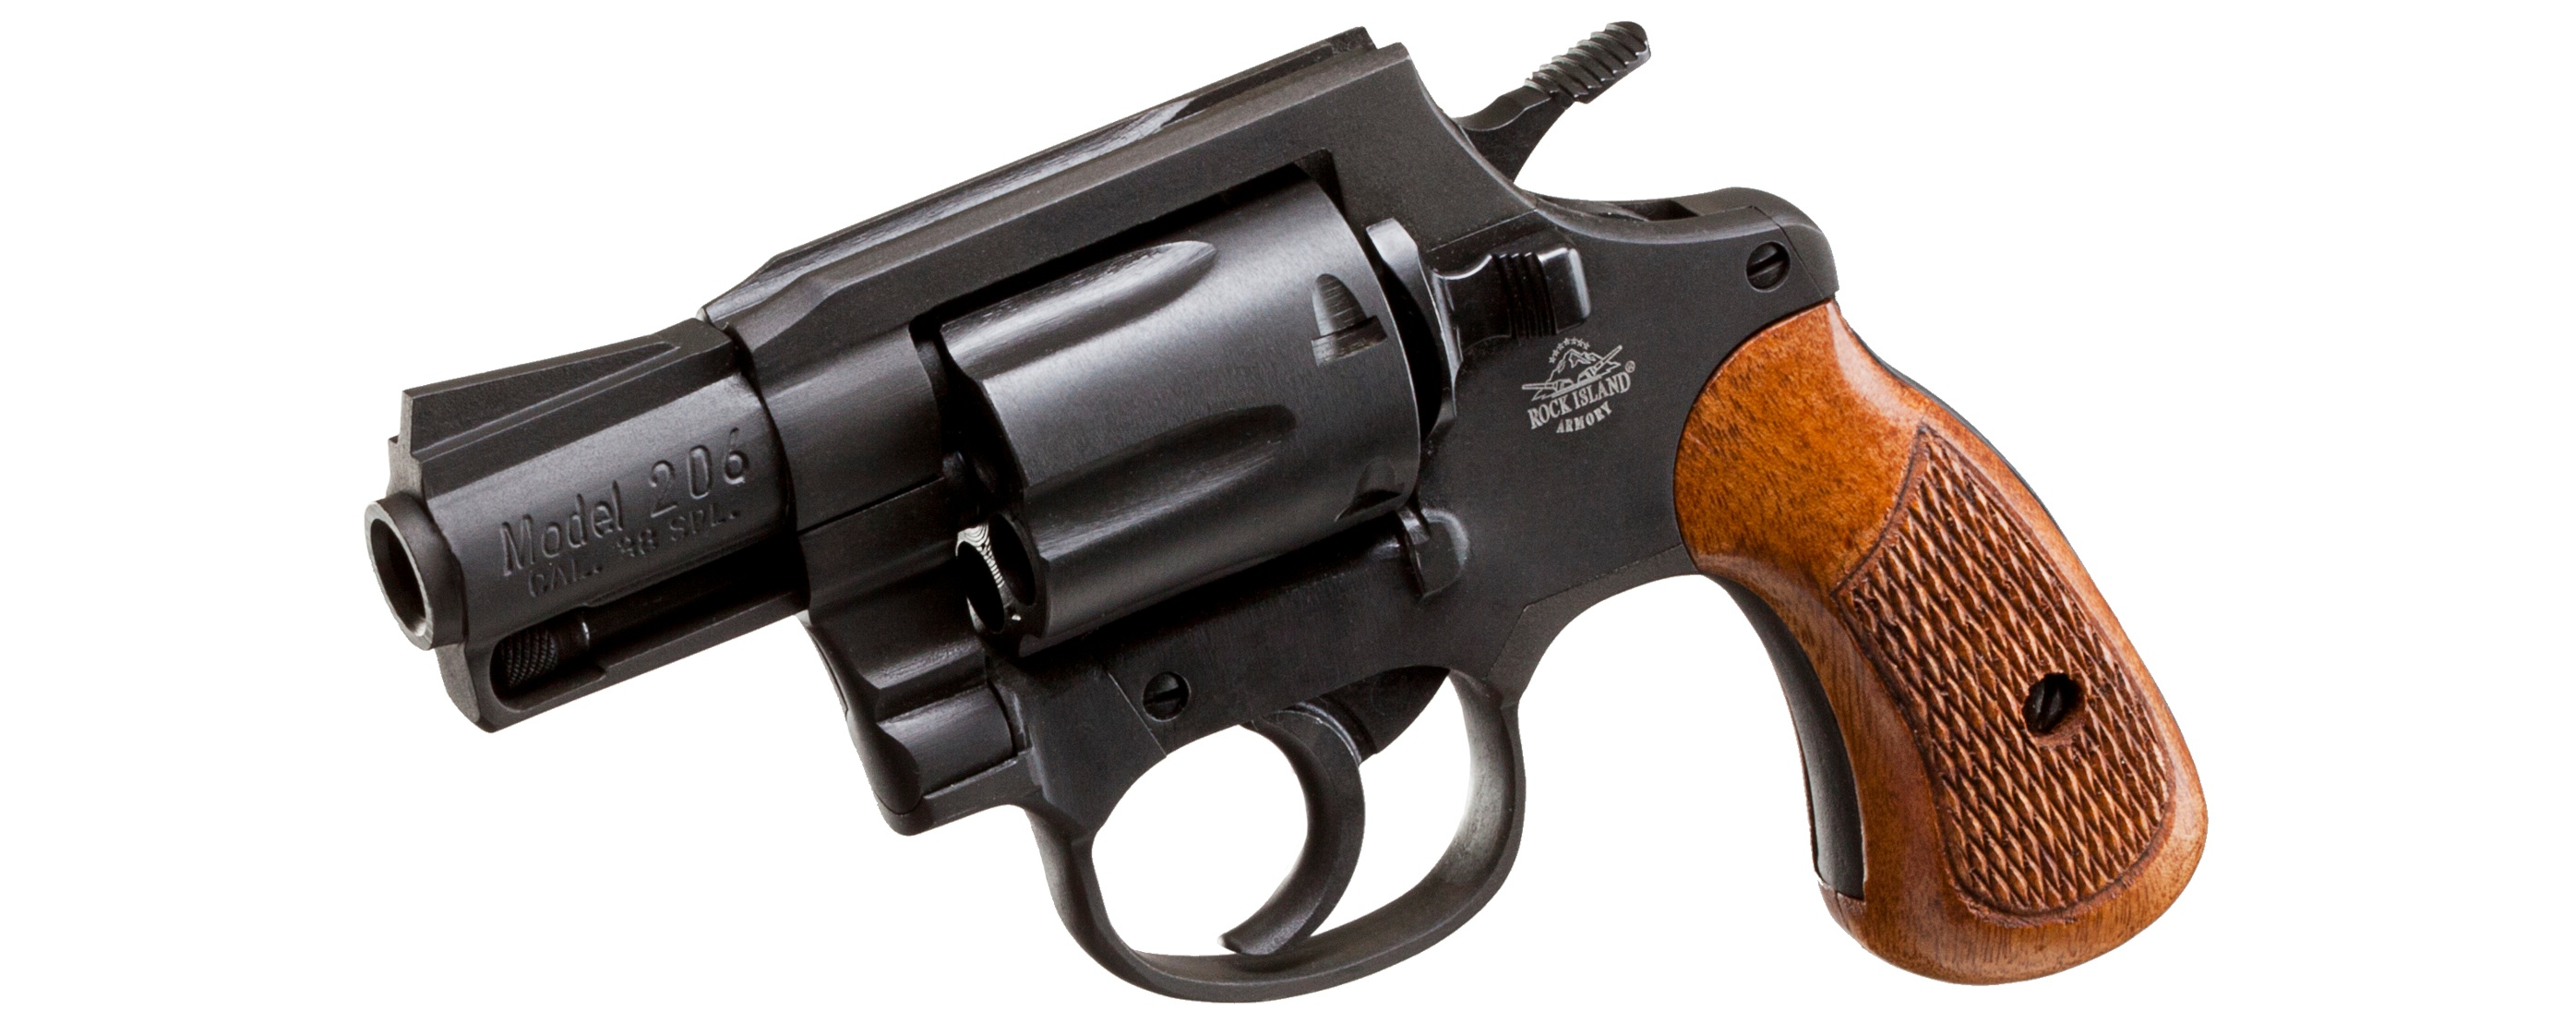 51283_Revolver_M206_38sp_White.jpg